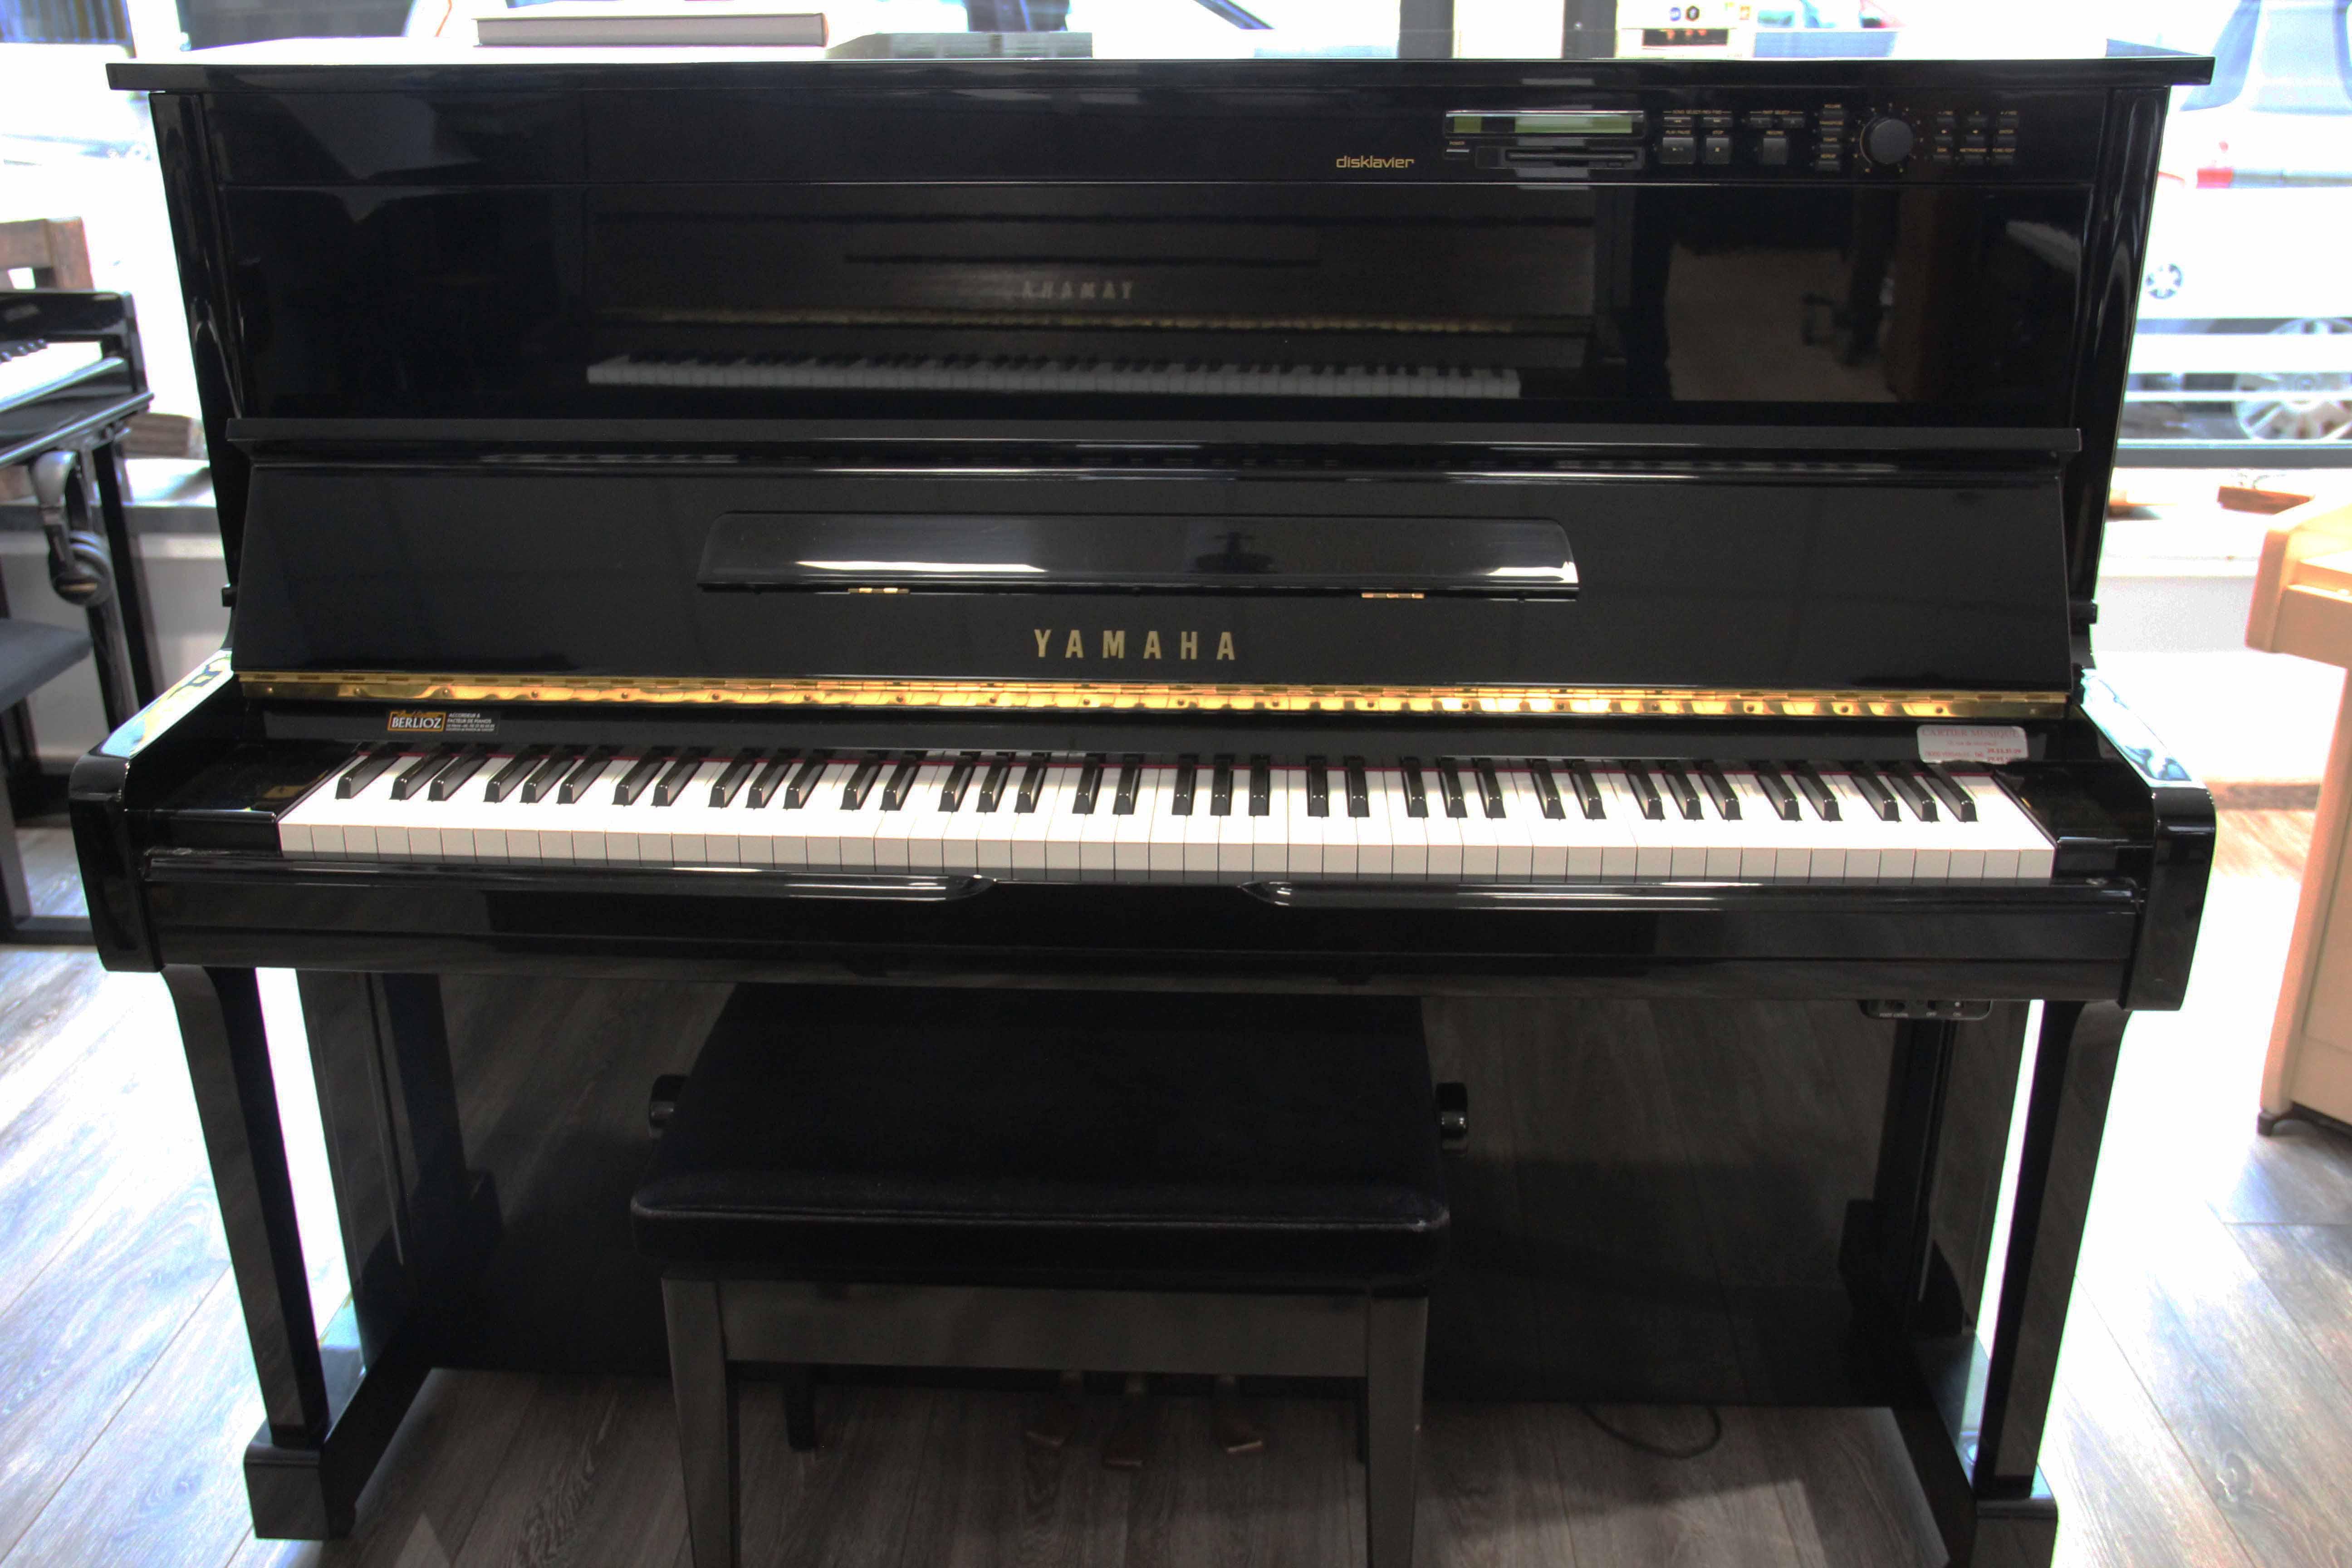 Yamaha u1 disklavier mx100 ii paul etienne berlioz for Yamaha u1 disklavier upright piano